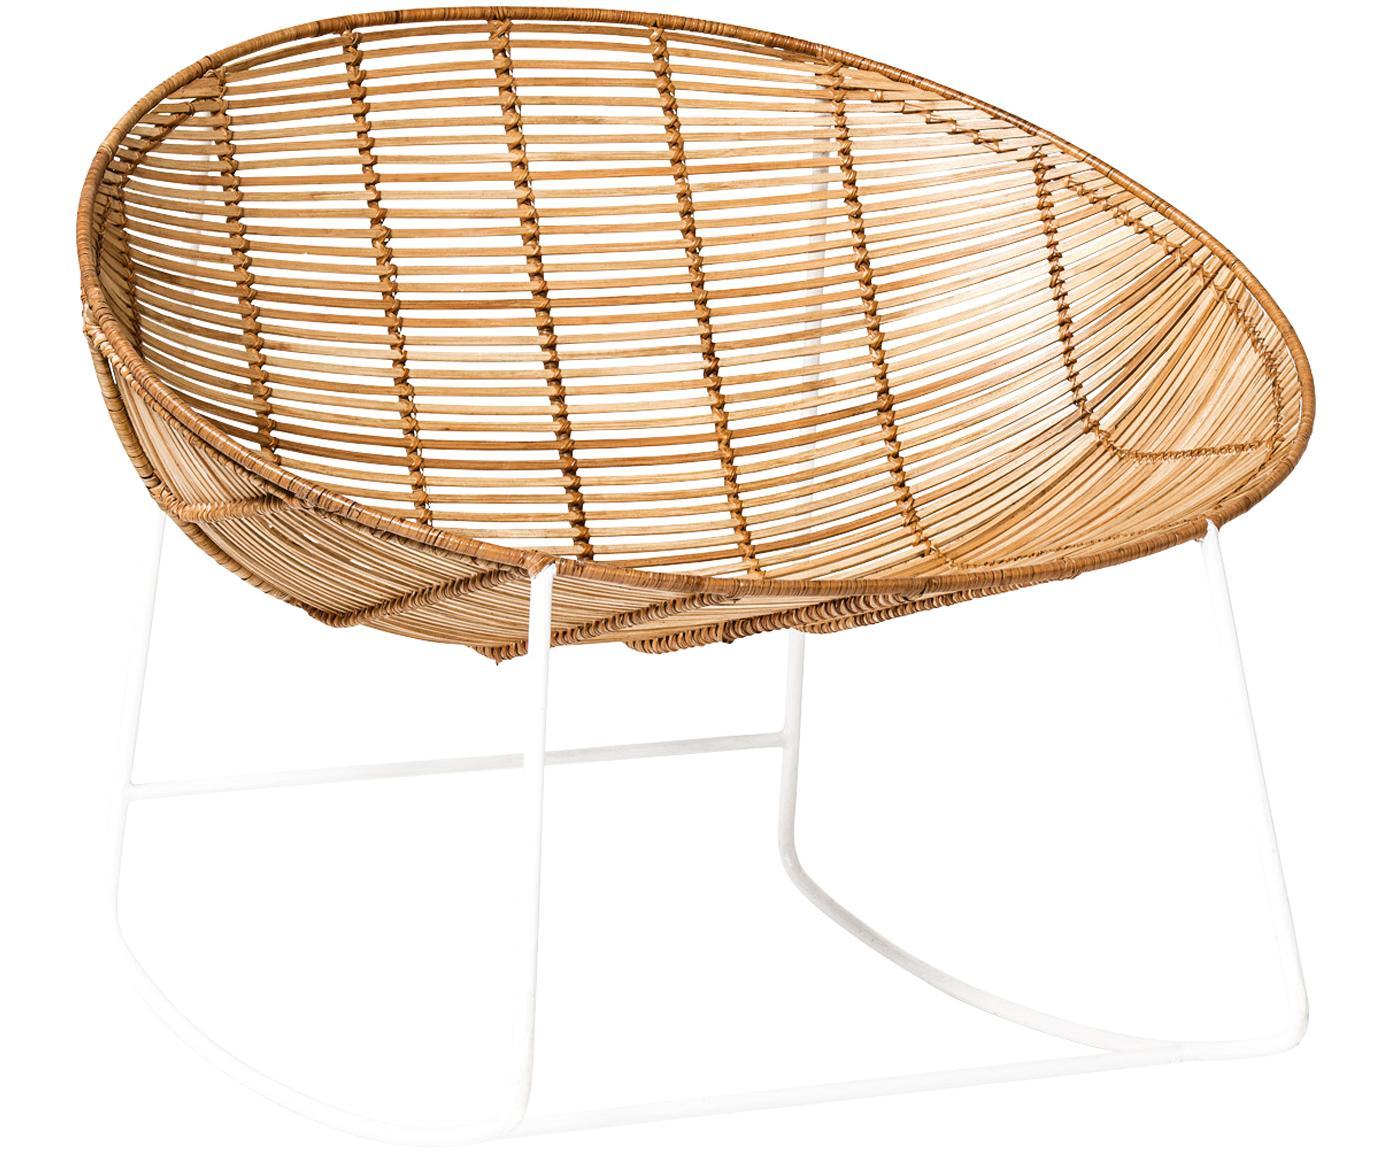 Mecedora Orinoco, Asiento: ratán, Estructura: metal, Asiento: ratán Estructura: blanco, An 92 x Al 76 cm